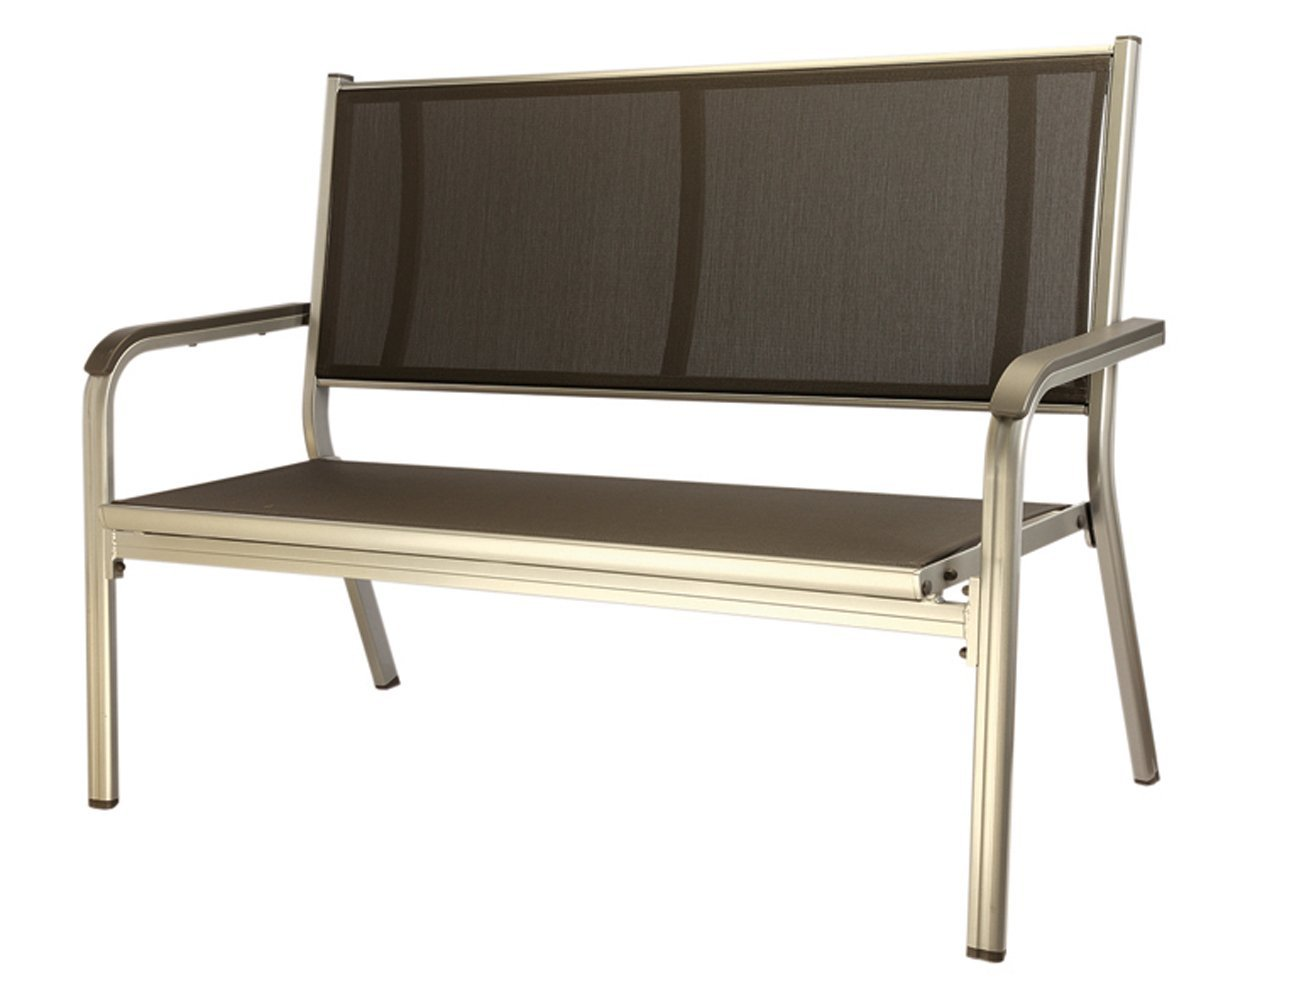 Gartenbank Kunststoff Kettler 2 Sitzer Basic Silber Anthrazit